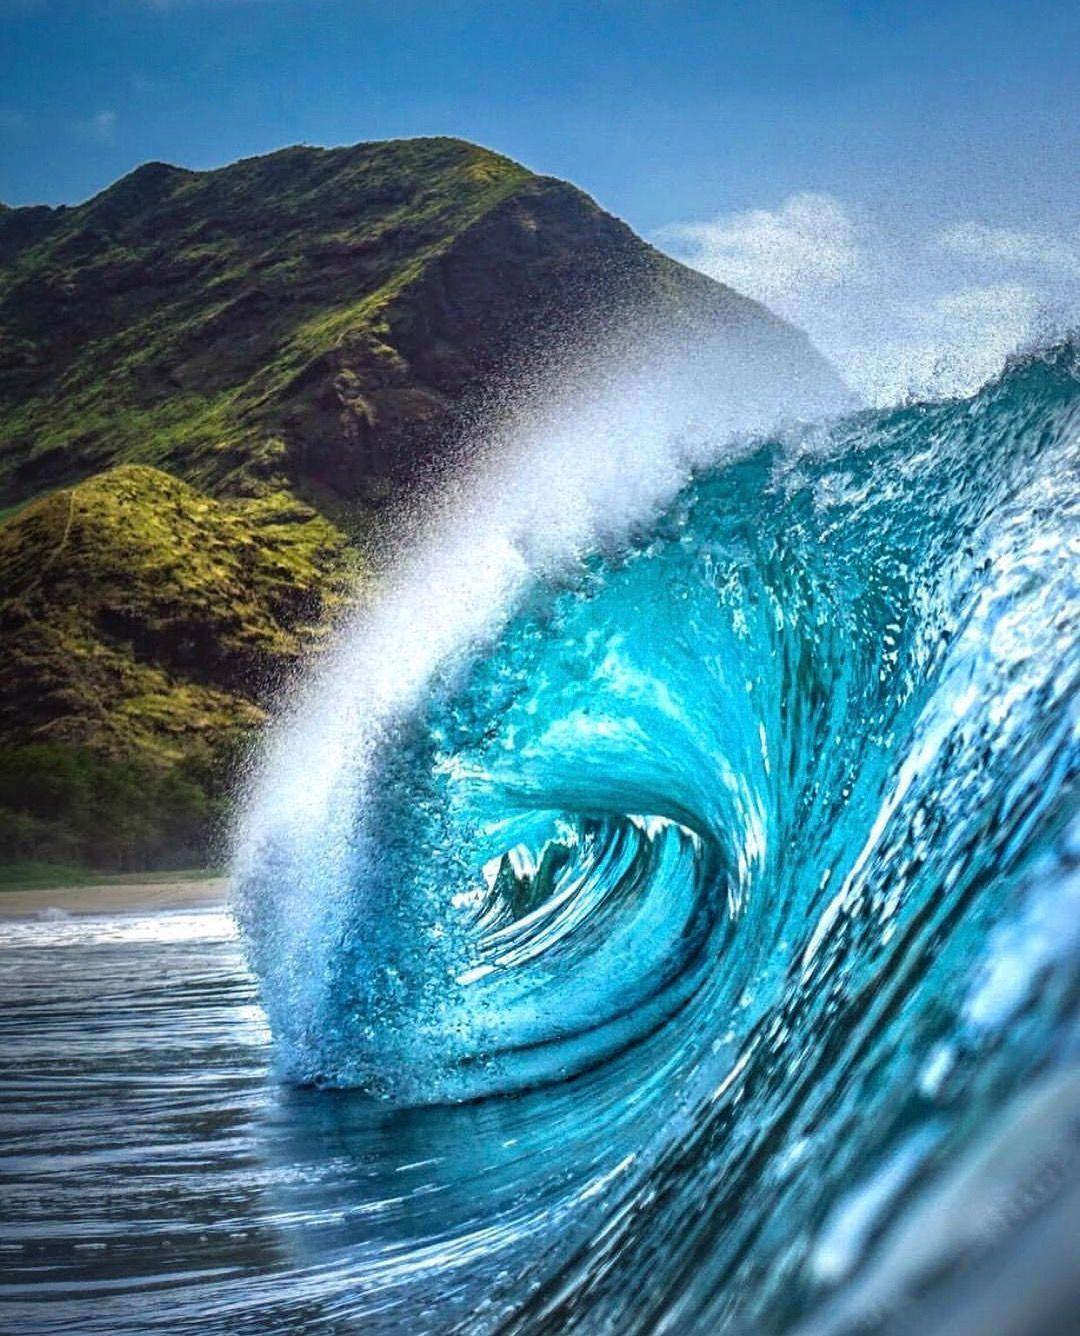 California Surfing 風景 波アート 景色